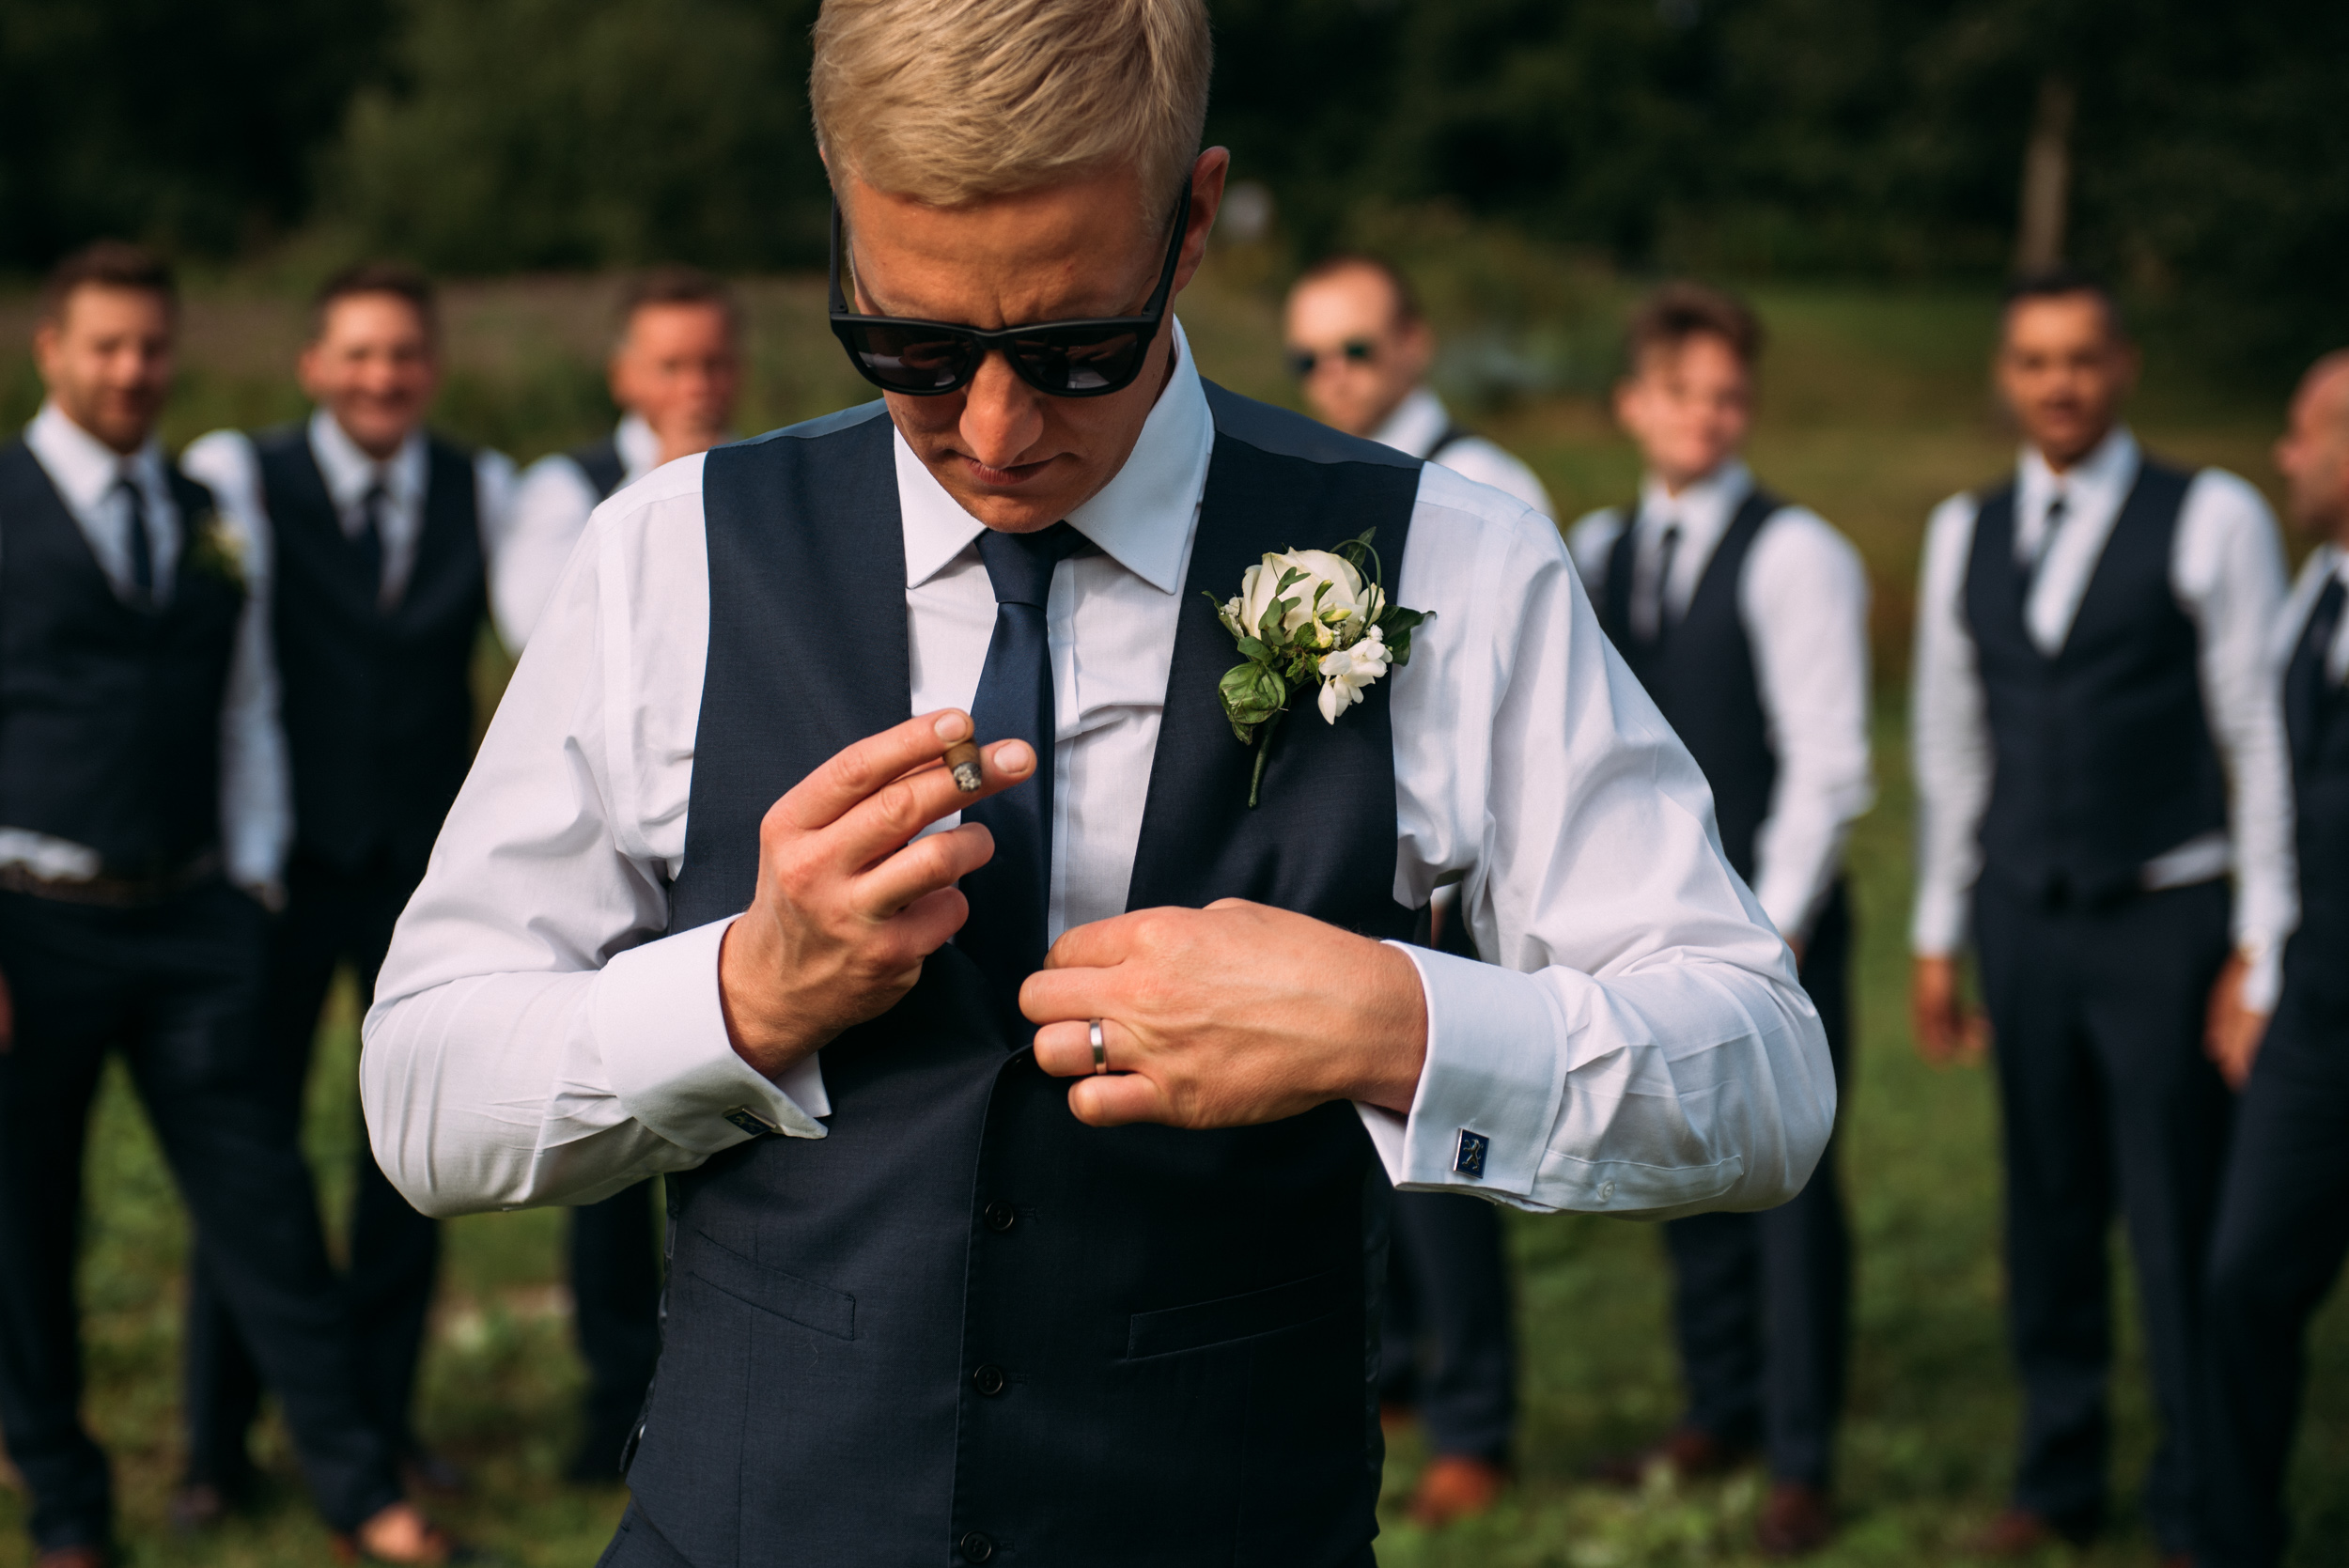 David Scholes Lancashire wedding photography 2016-145.jpg